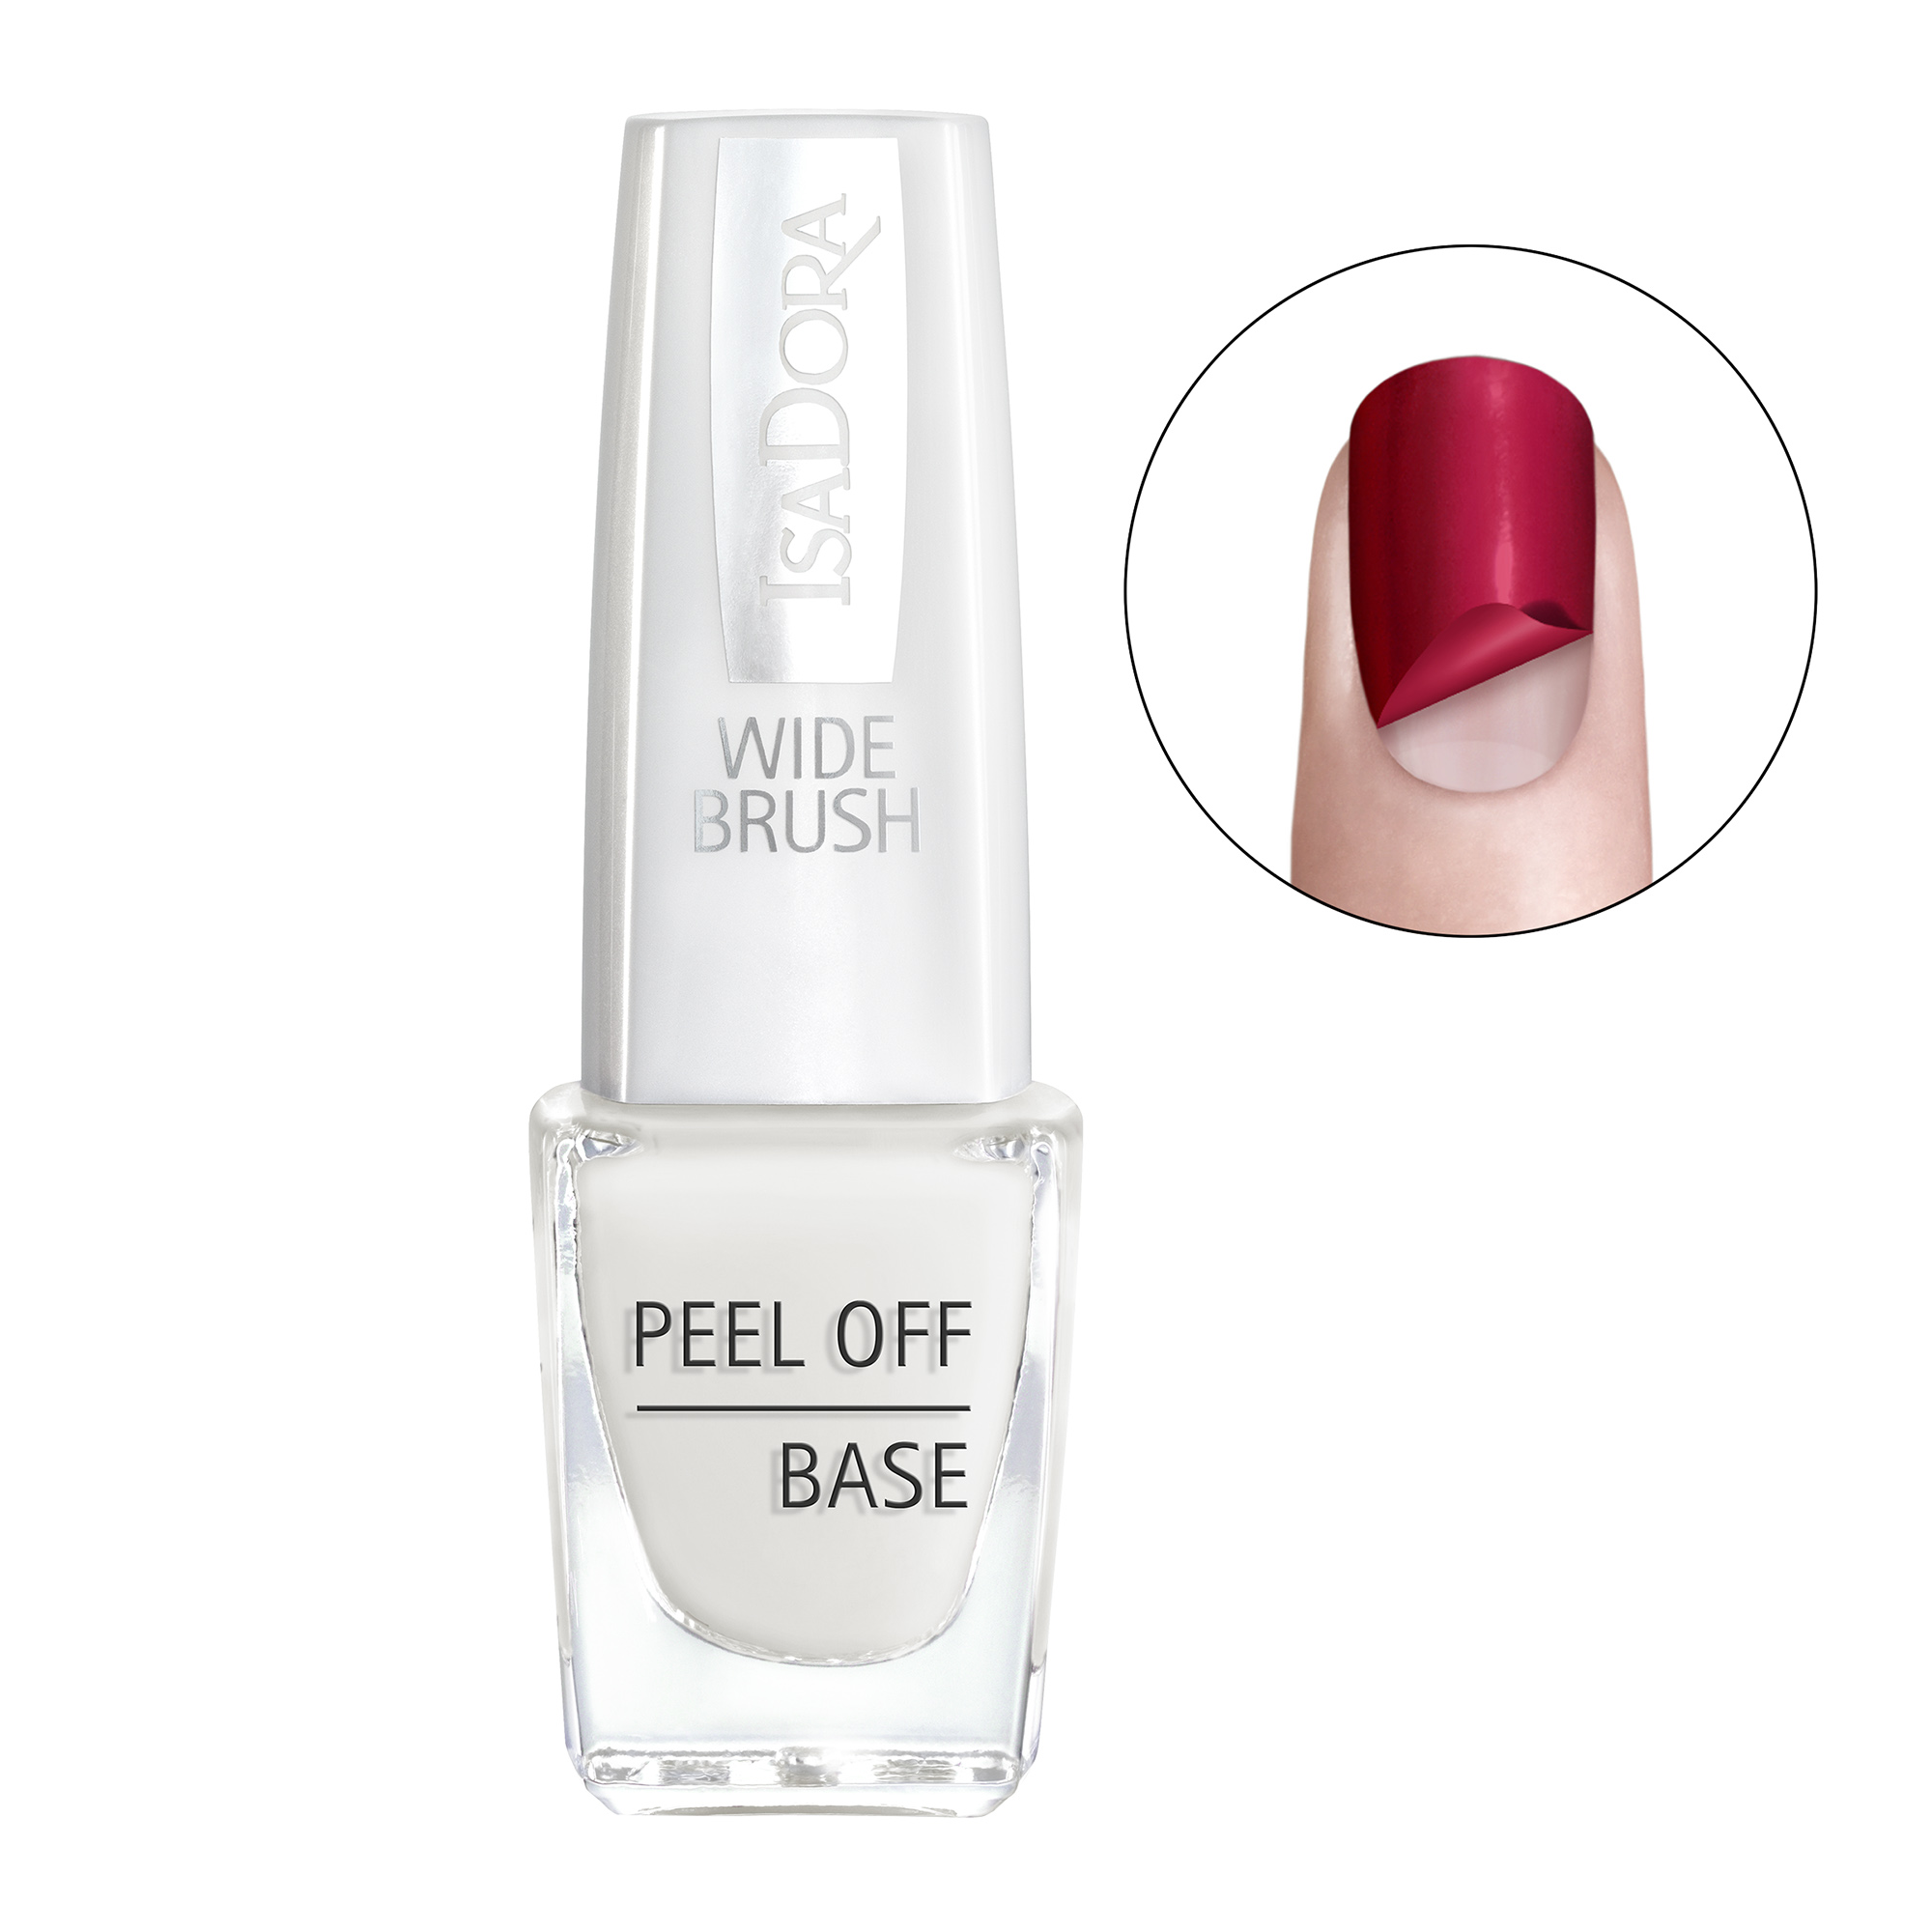 Peel Off Base